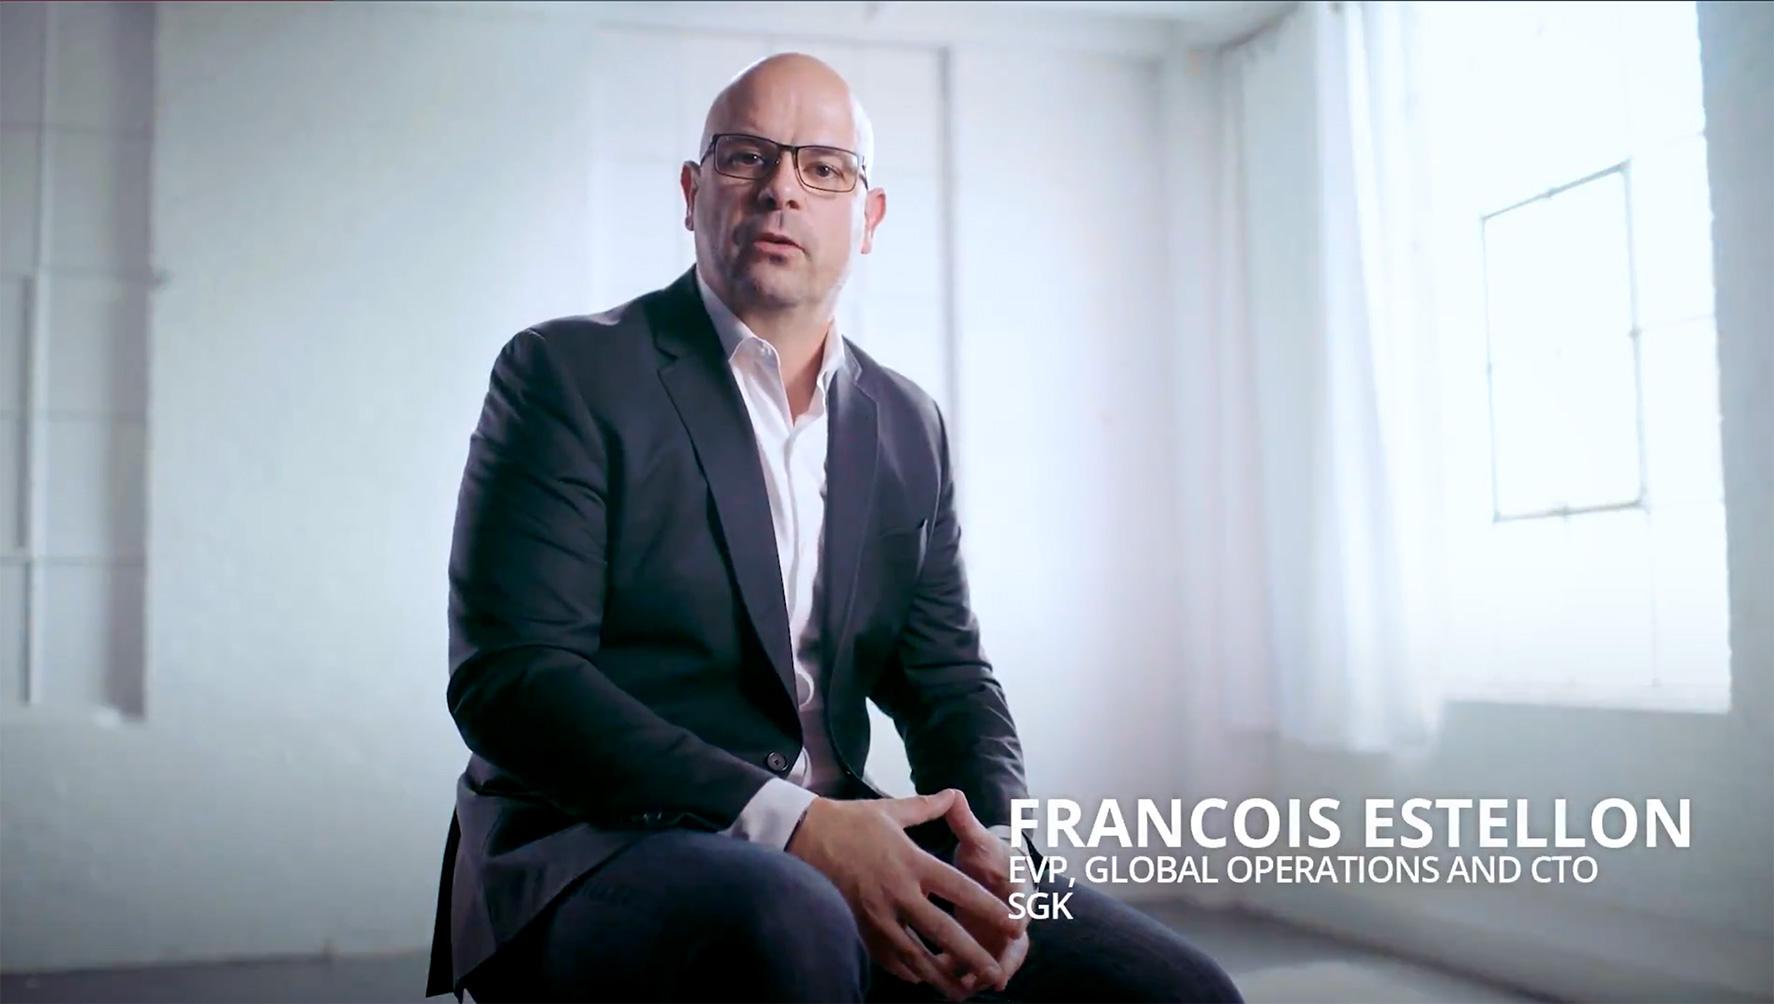 Francois Estellon